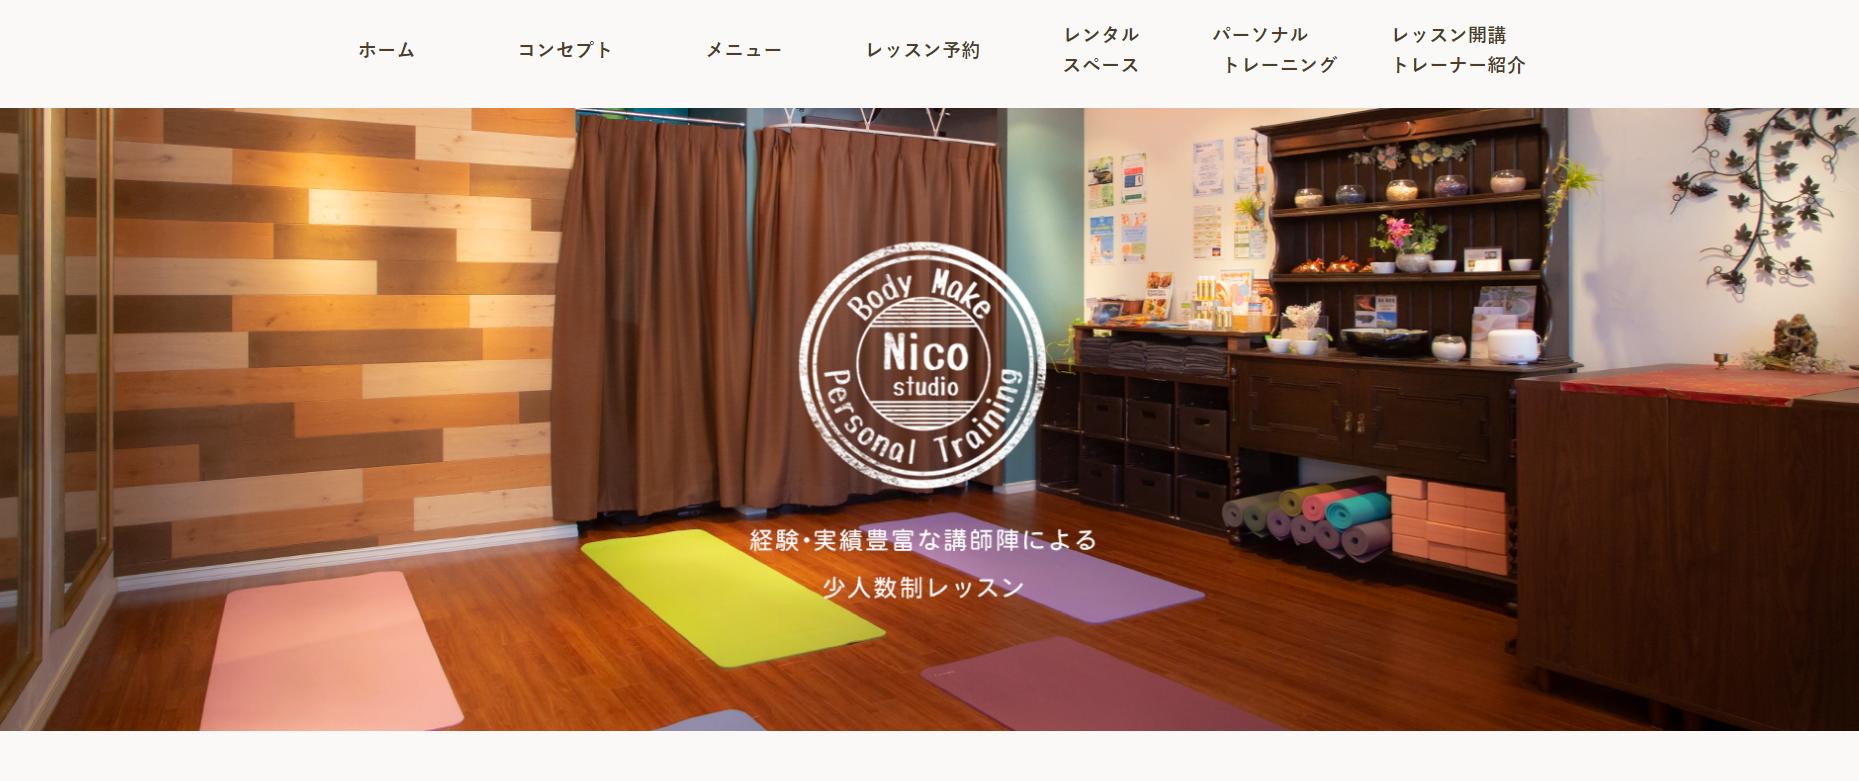 Nico Studio(ニコスタジオ)